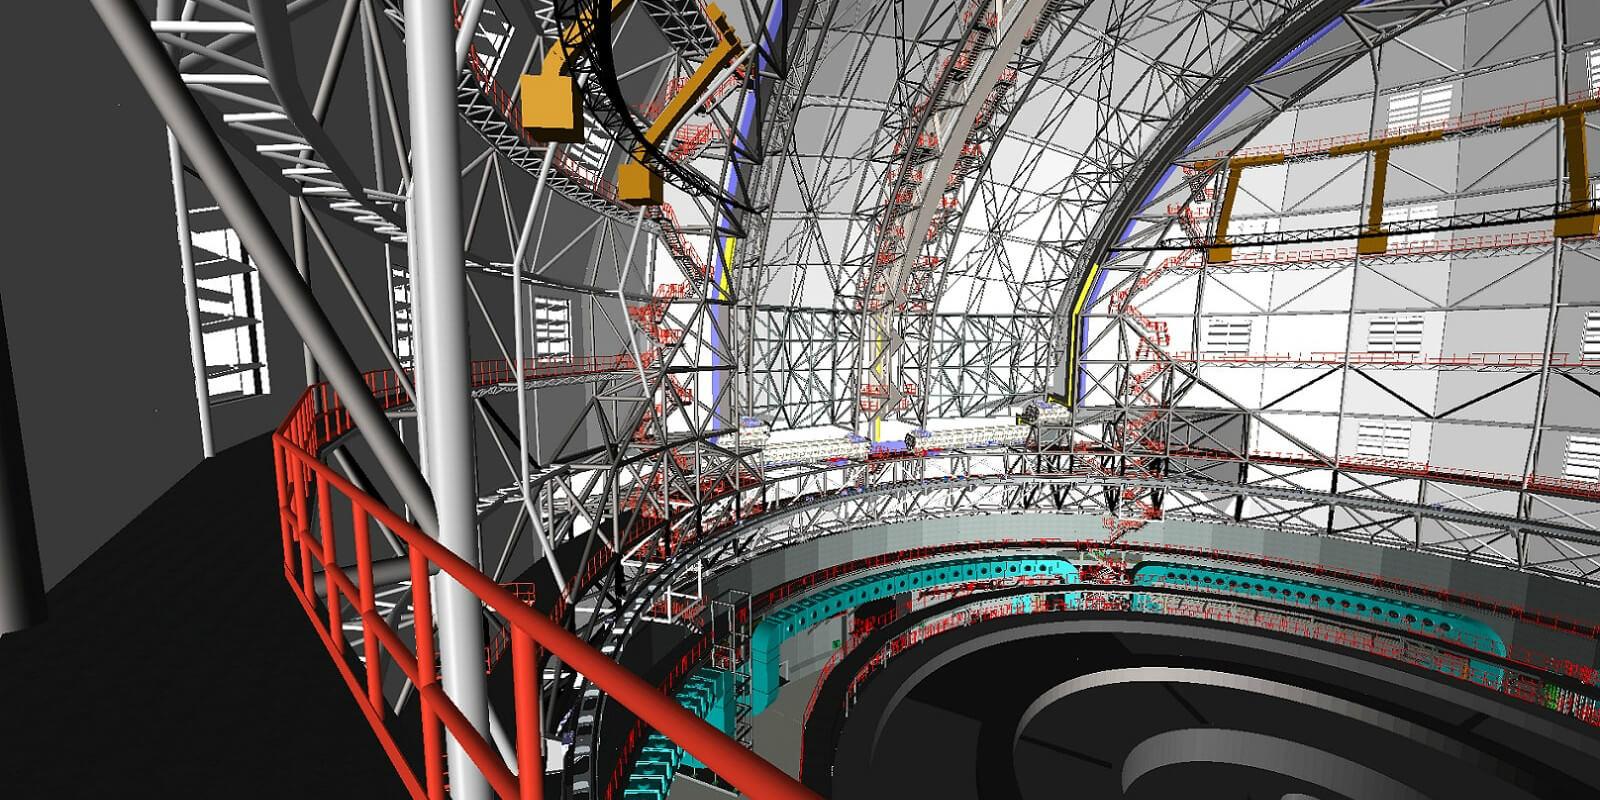 E-ELT_European_Extremely_Large_Telescope_Dome_Astronomy_Chile_IDOM_ADA_3_